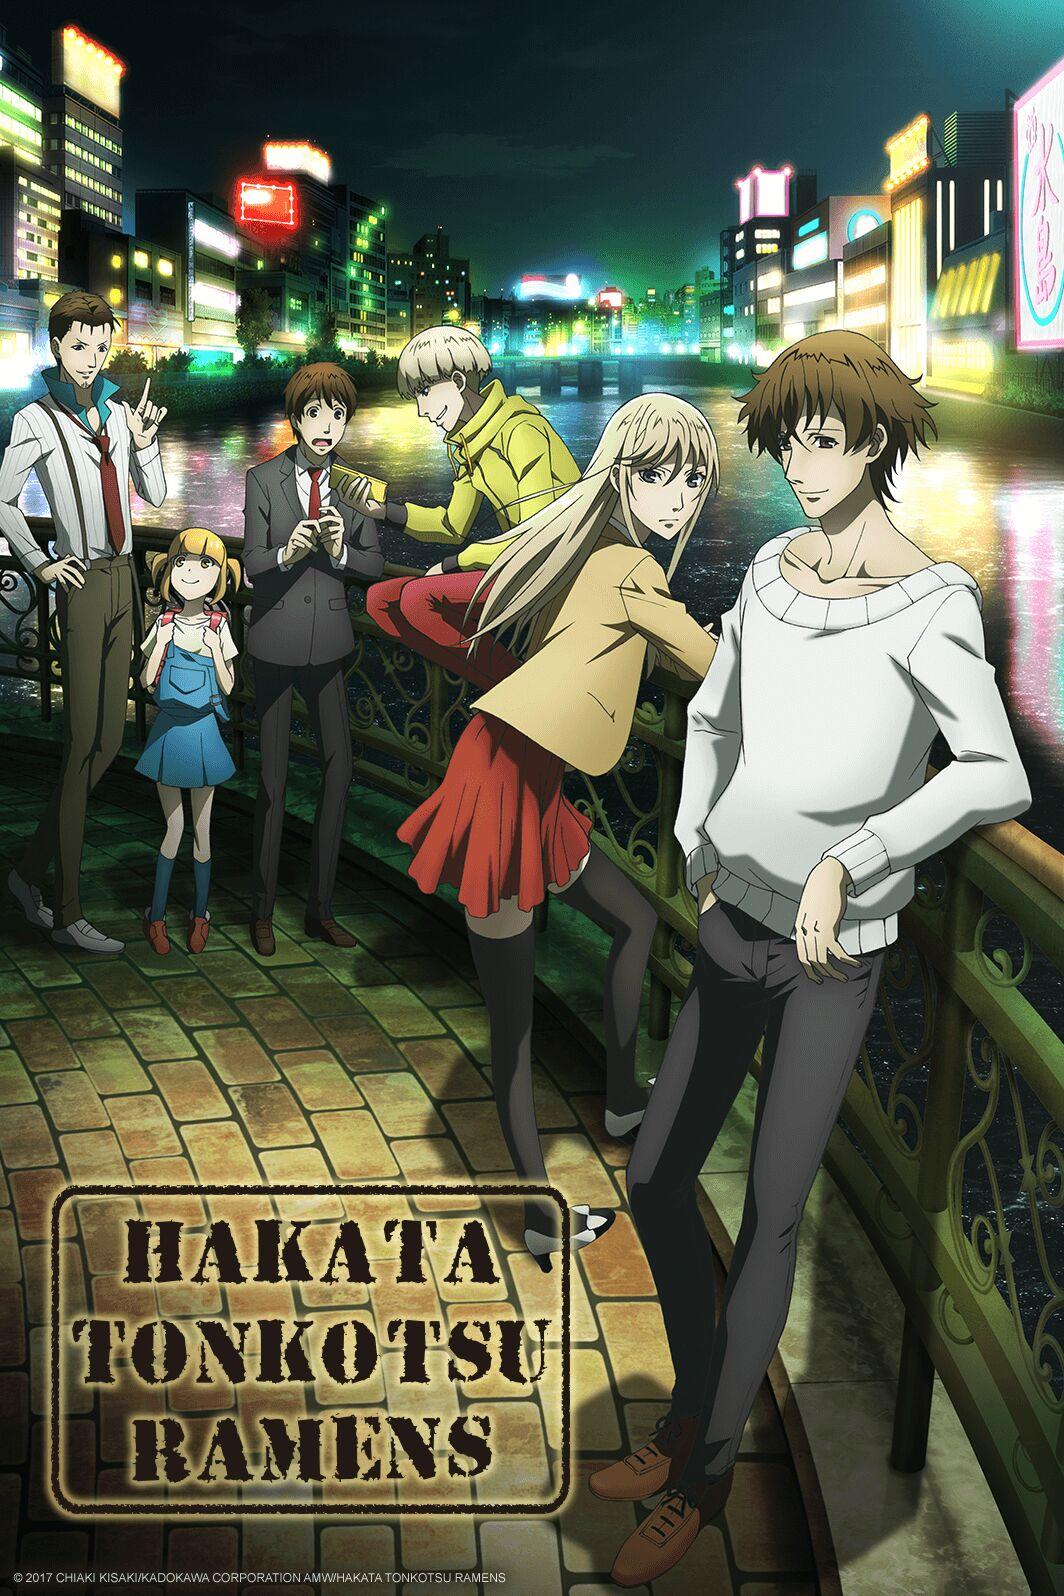 Hakata Tonkotsu Ramens - Anime